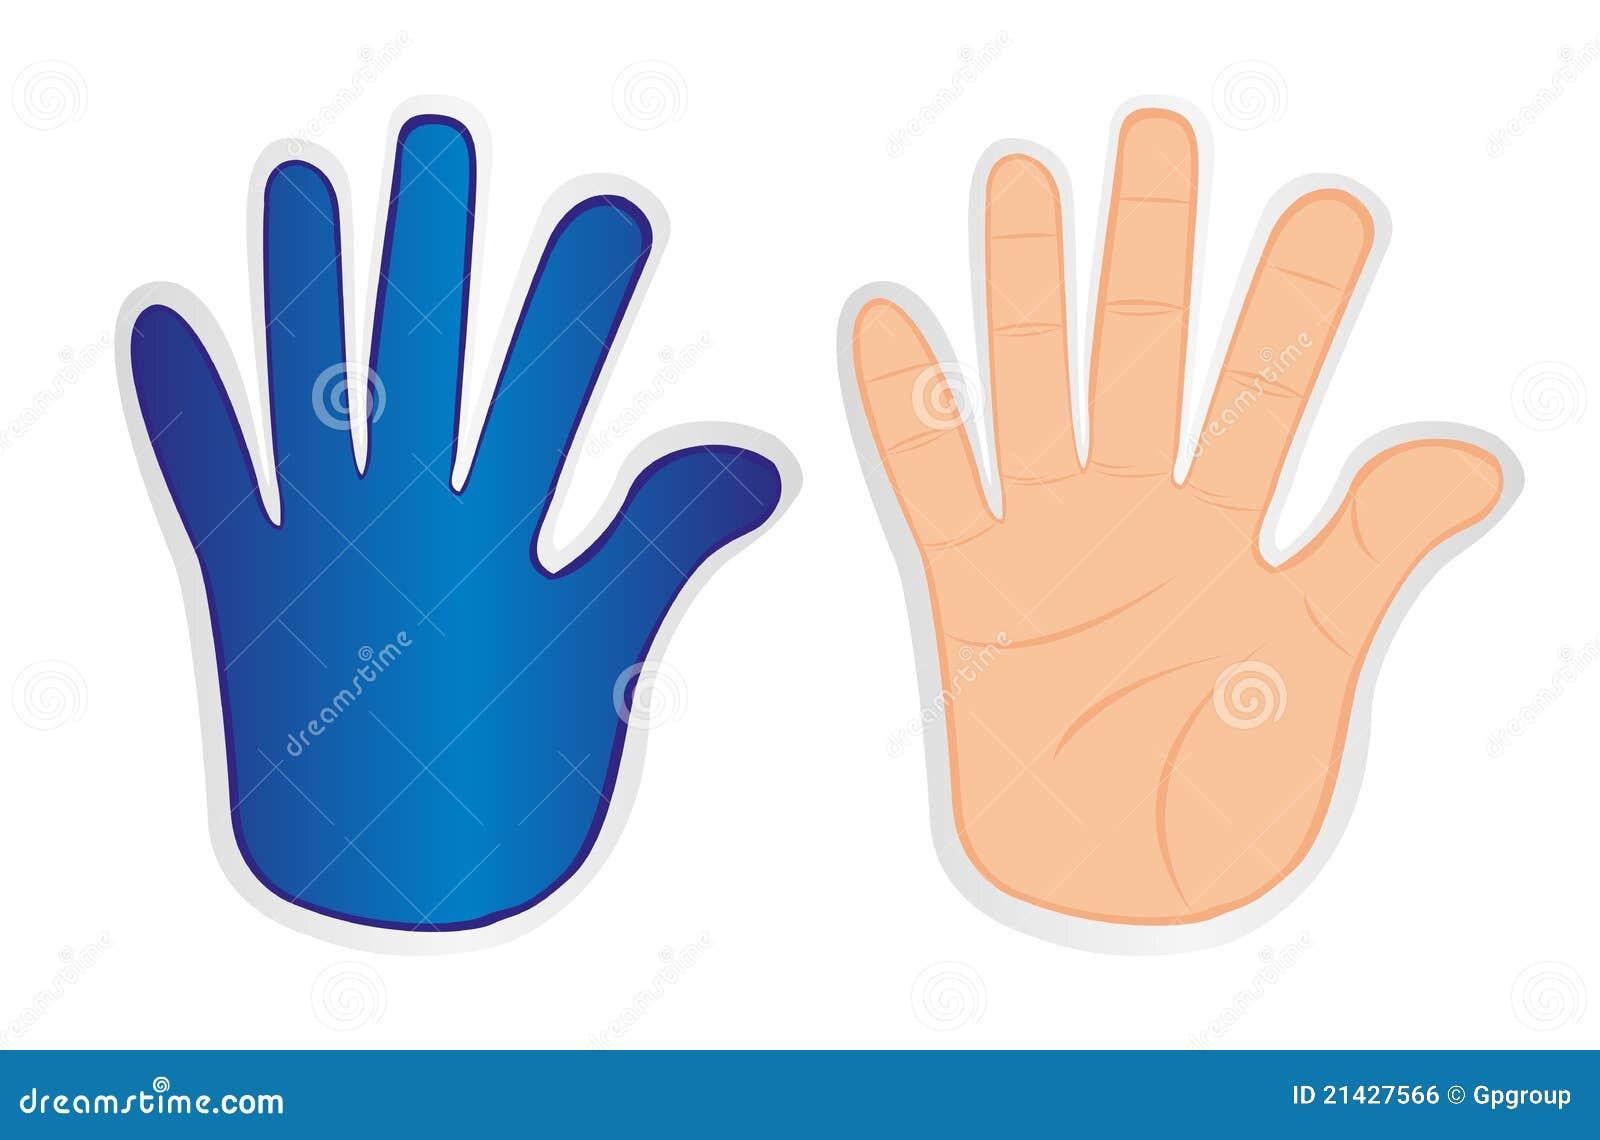 Hands stickers